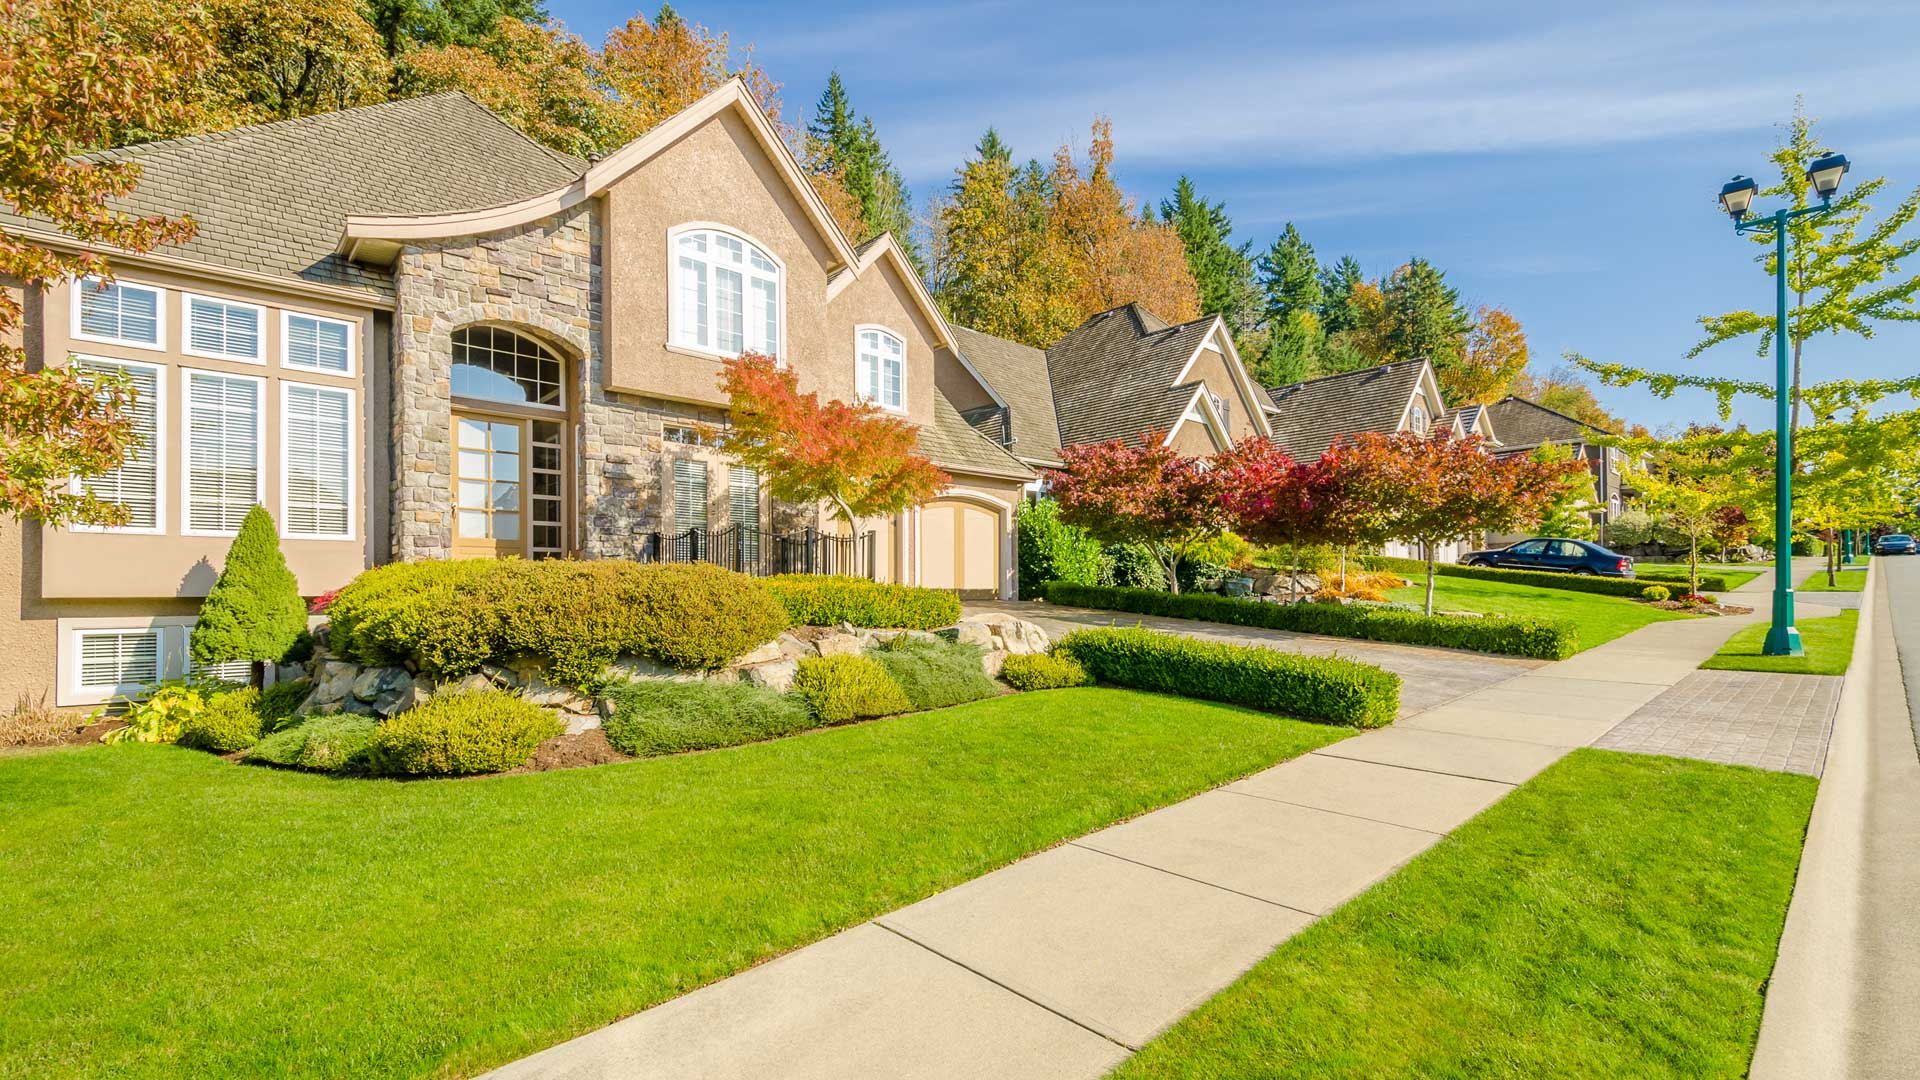 Lawn Care Services, Landscaping, Aeration: Davison, Burton, Flint ...